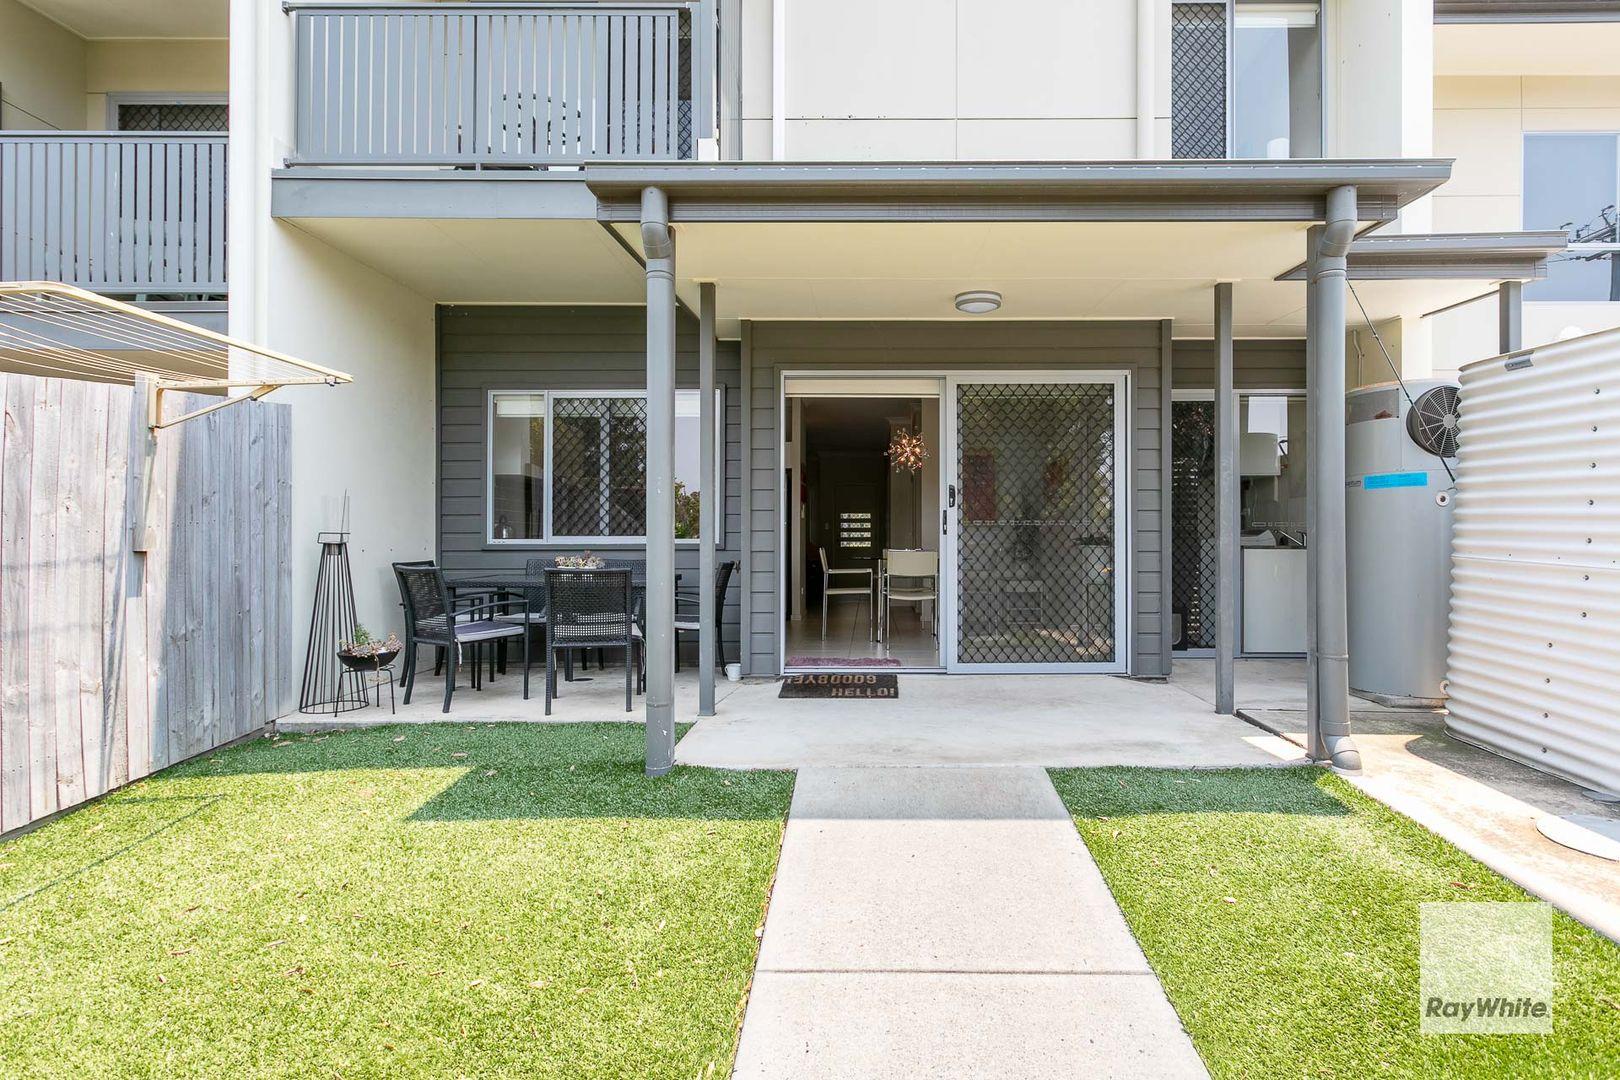 3/62-64 Valantine Road, Birkdale QLD 4159, Image 0